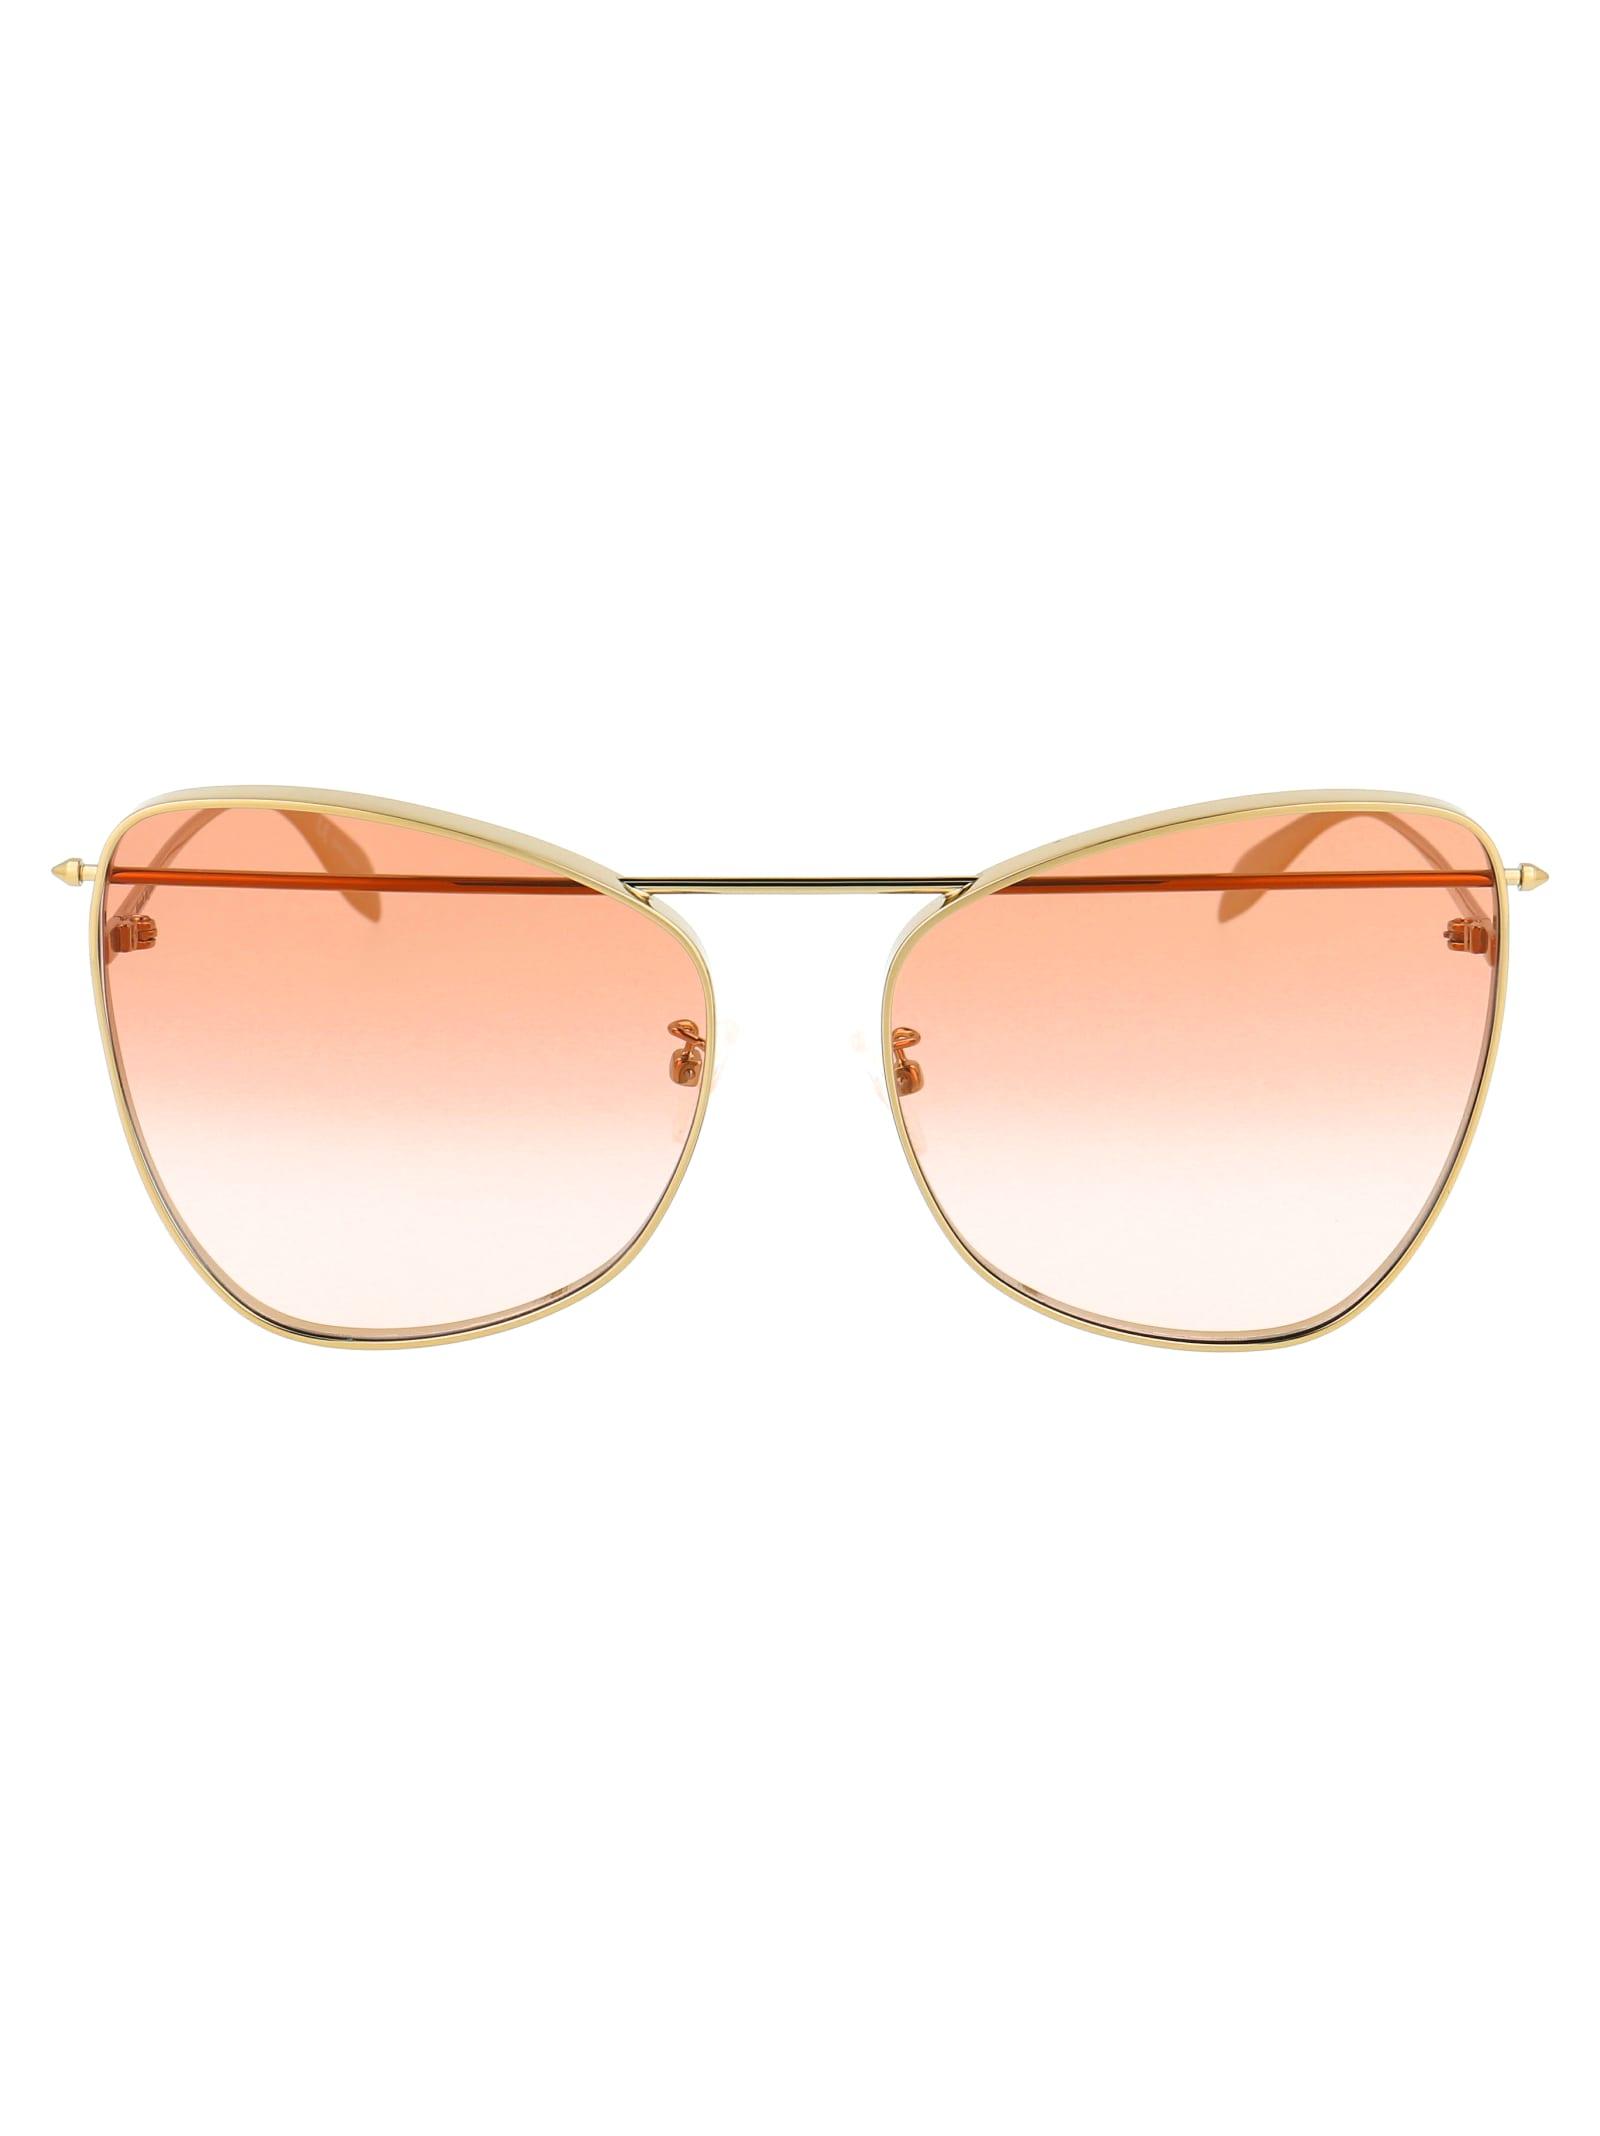 Am0228s Sunglasses